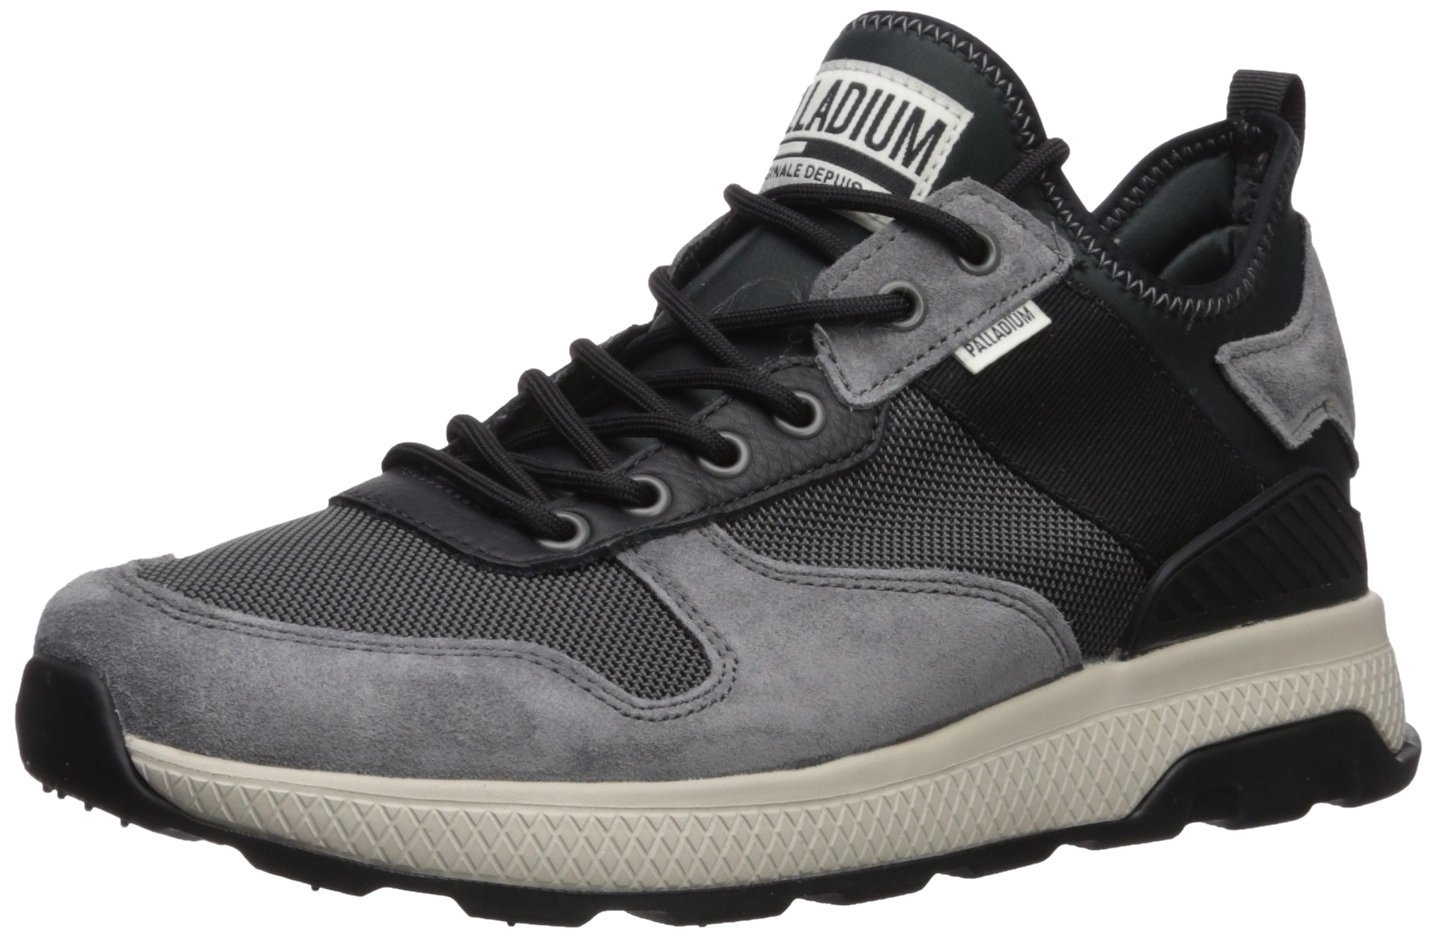 Palladium Men's AX Eon Army Runner Sneaker, Grey, 10 Medium US